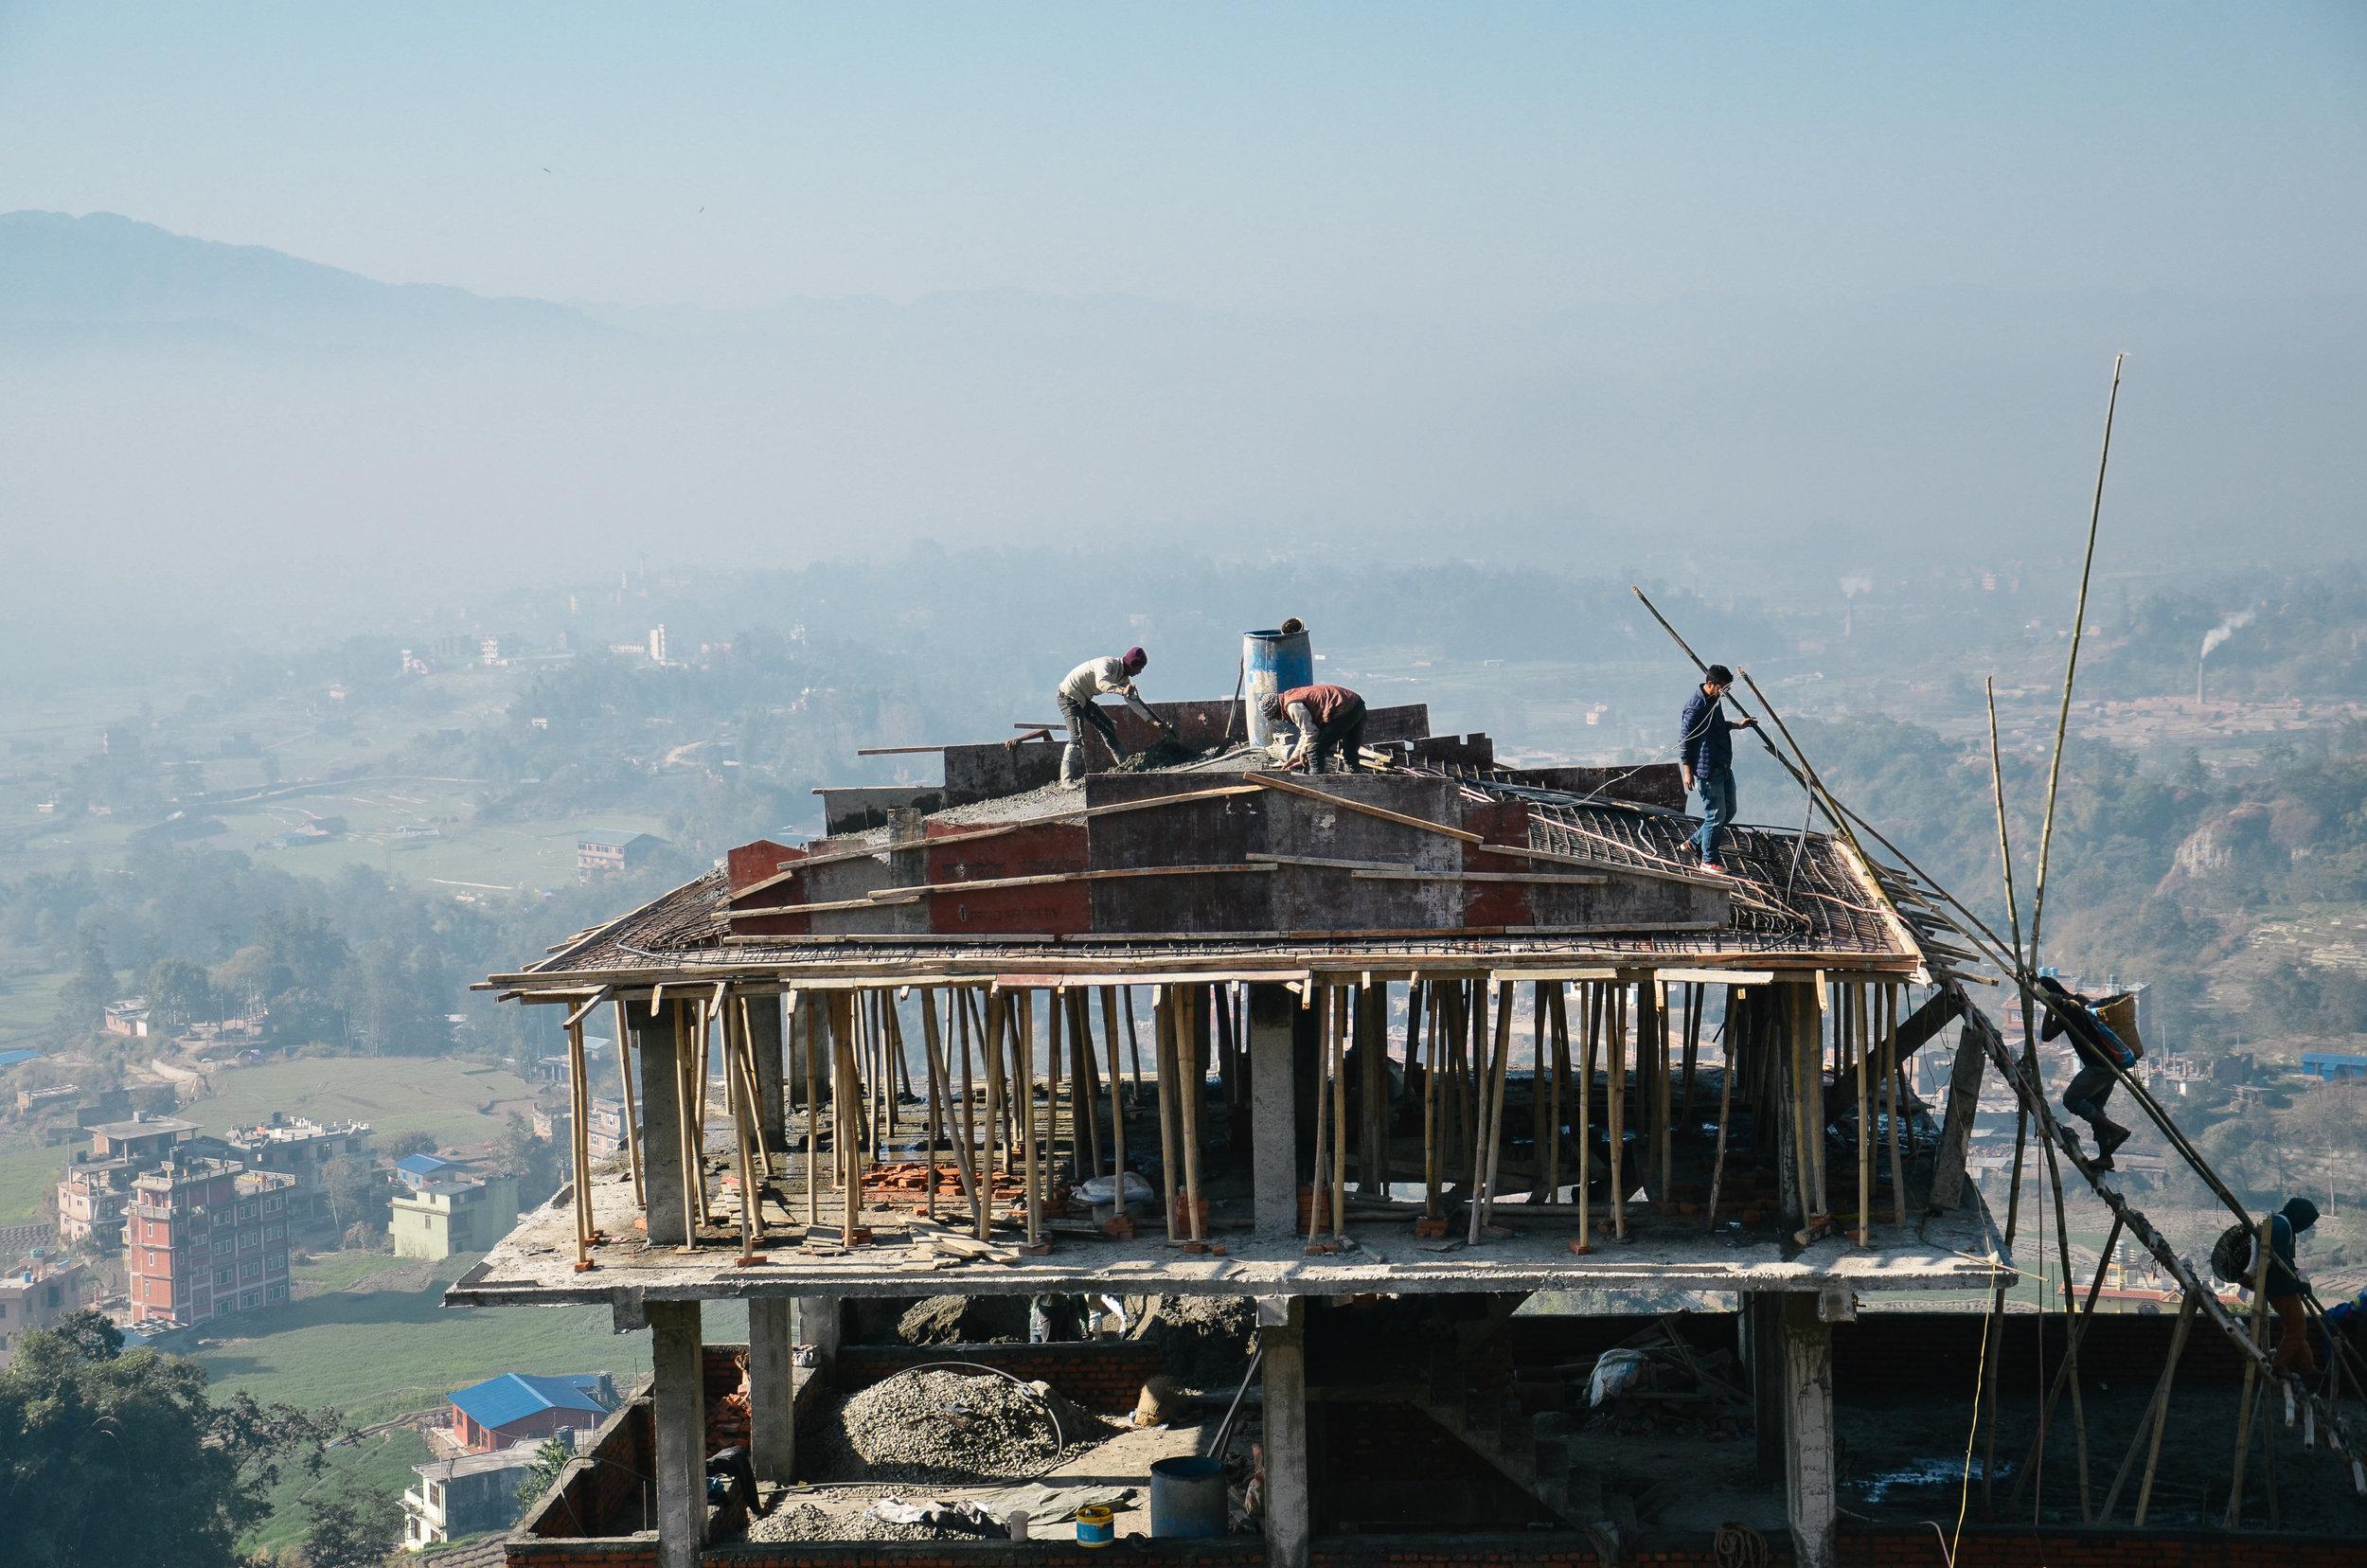 10-things-to-know-kathmandu-nepal-lifeonpine_DSC_0570.jpg